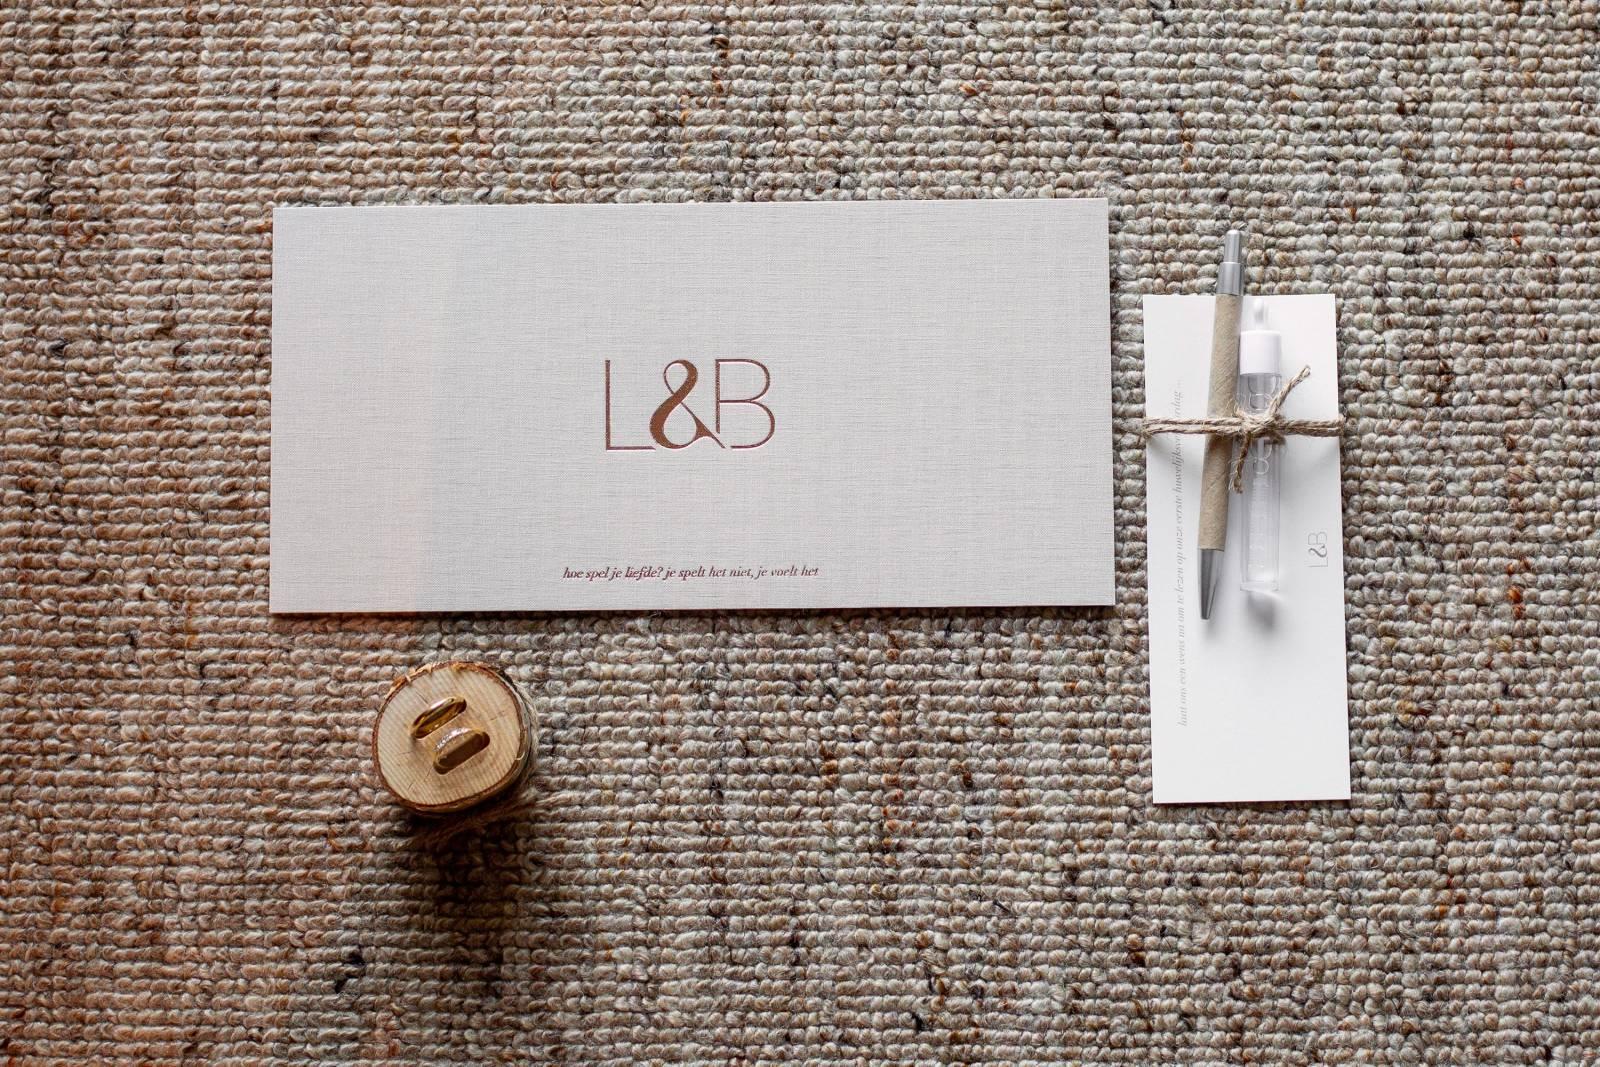 Scarabar - Trouwuitnodiging - Huwelijksuitnodiging - Drukwerk - Huwelijk - Trouw - Bruiloft - House of Weddings - 11